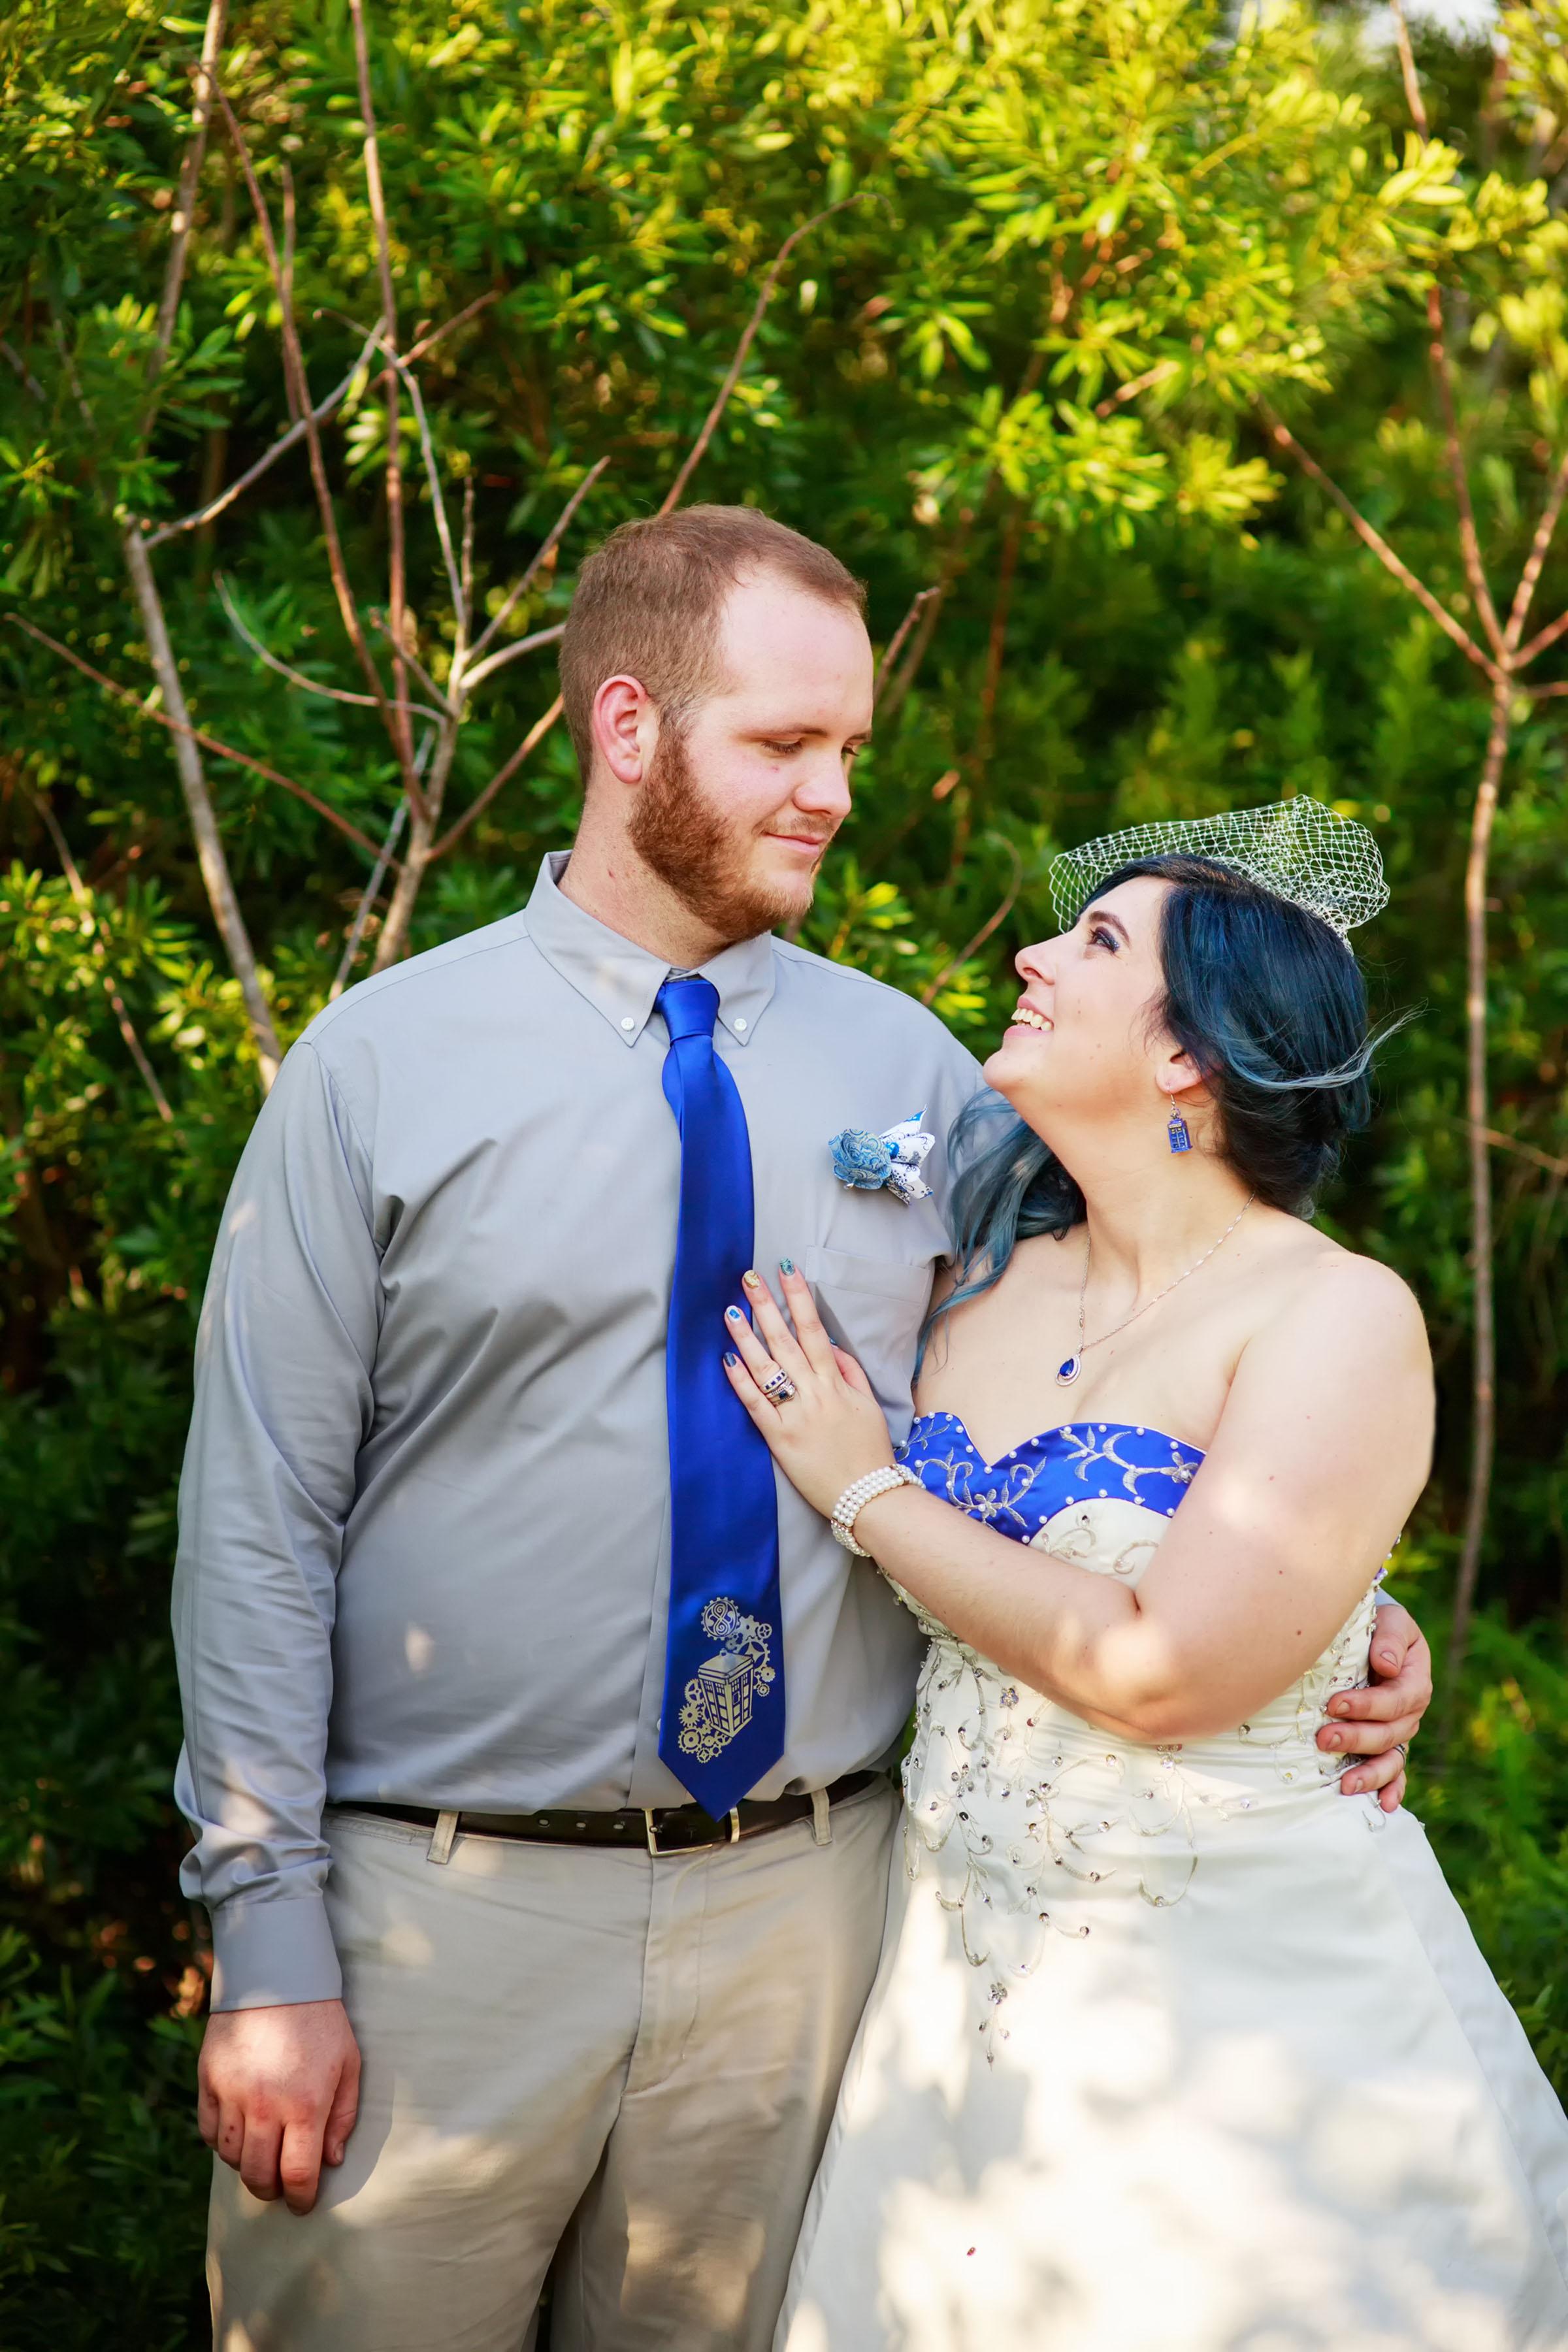 NC_Wedding_Photographer_Tiffany_Abruzzo_Photography_6.jpg